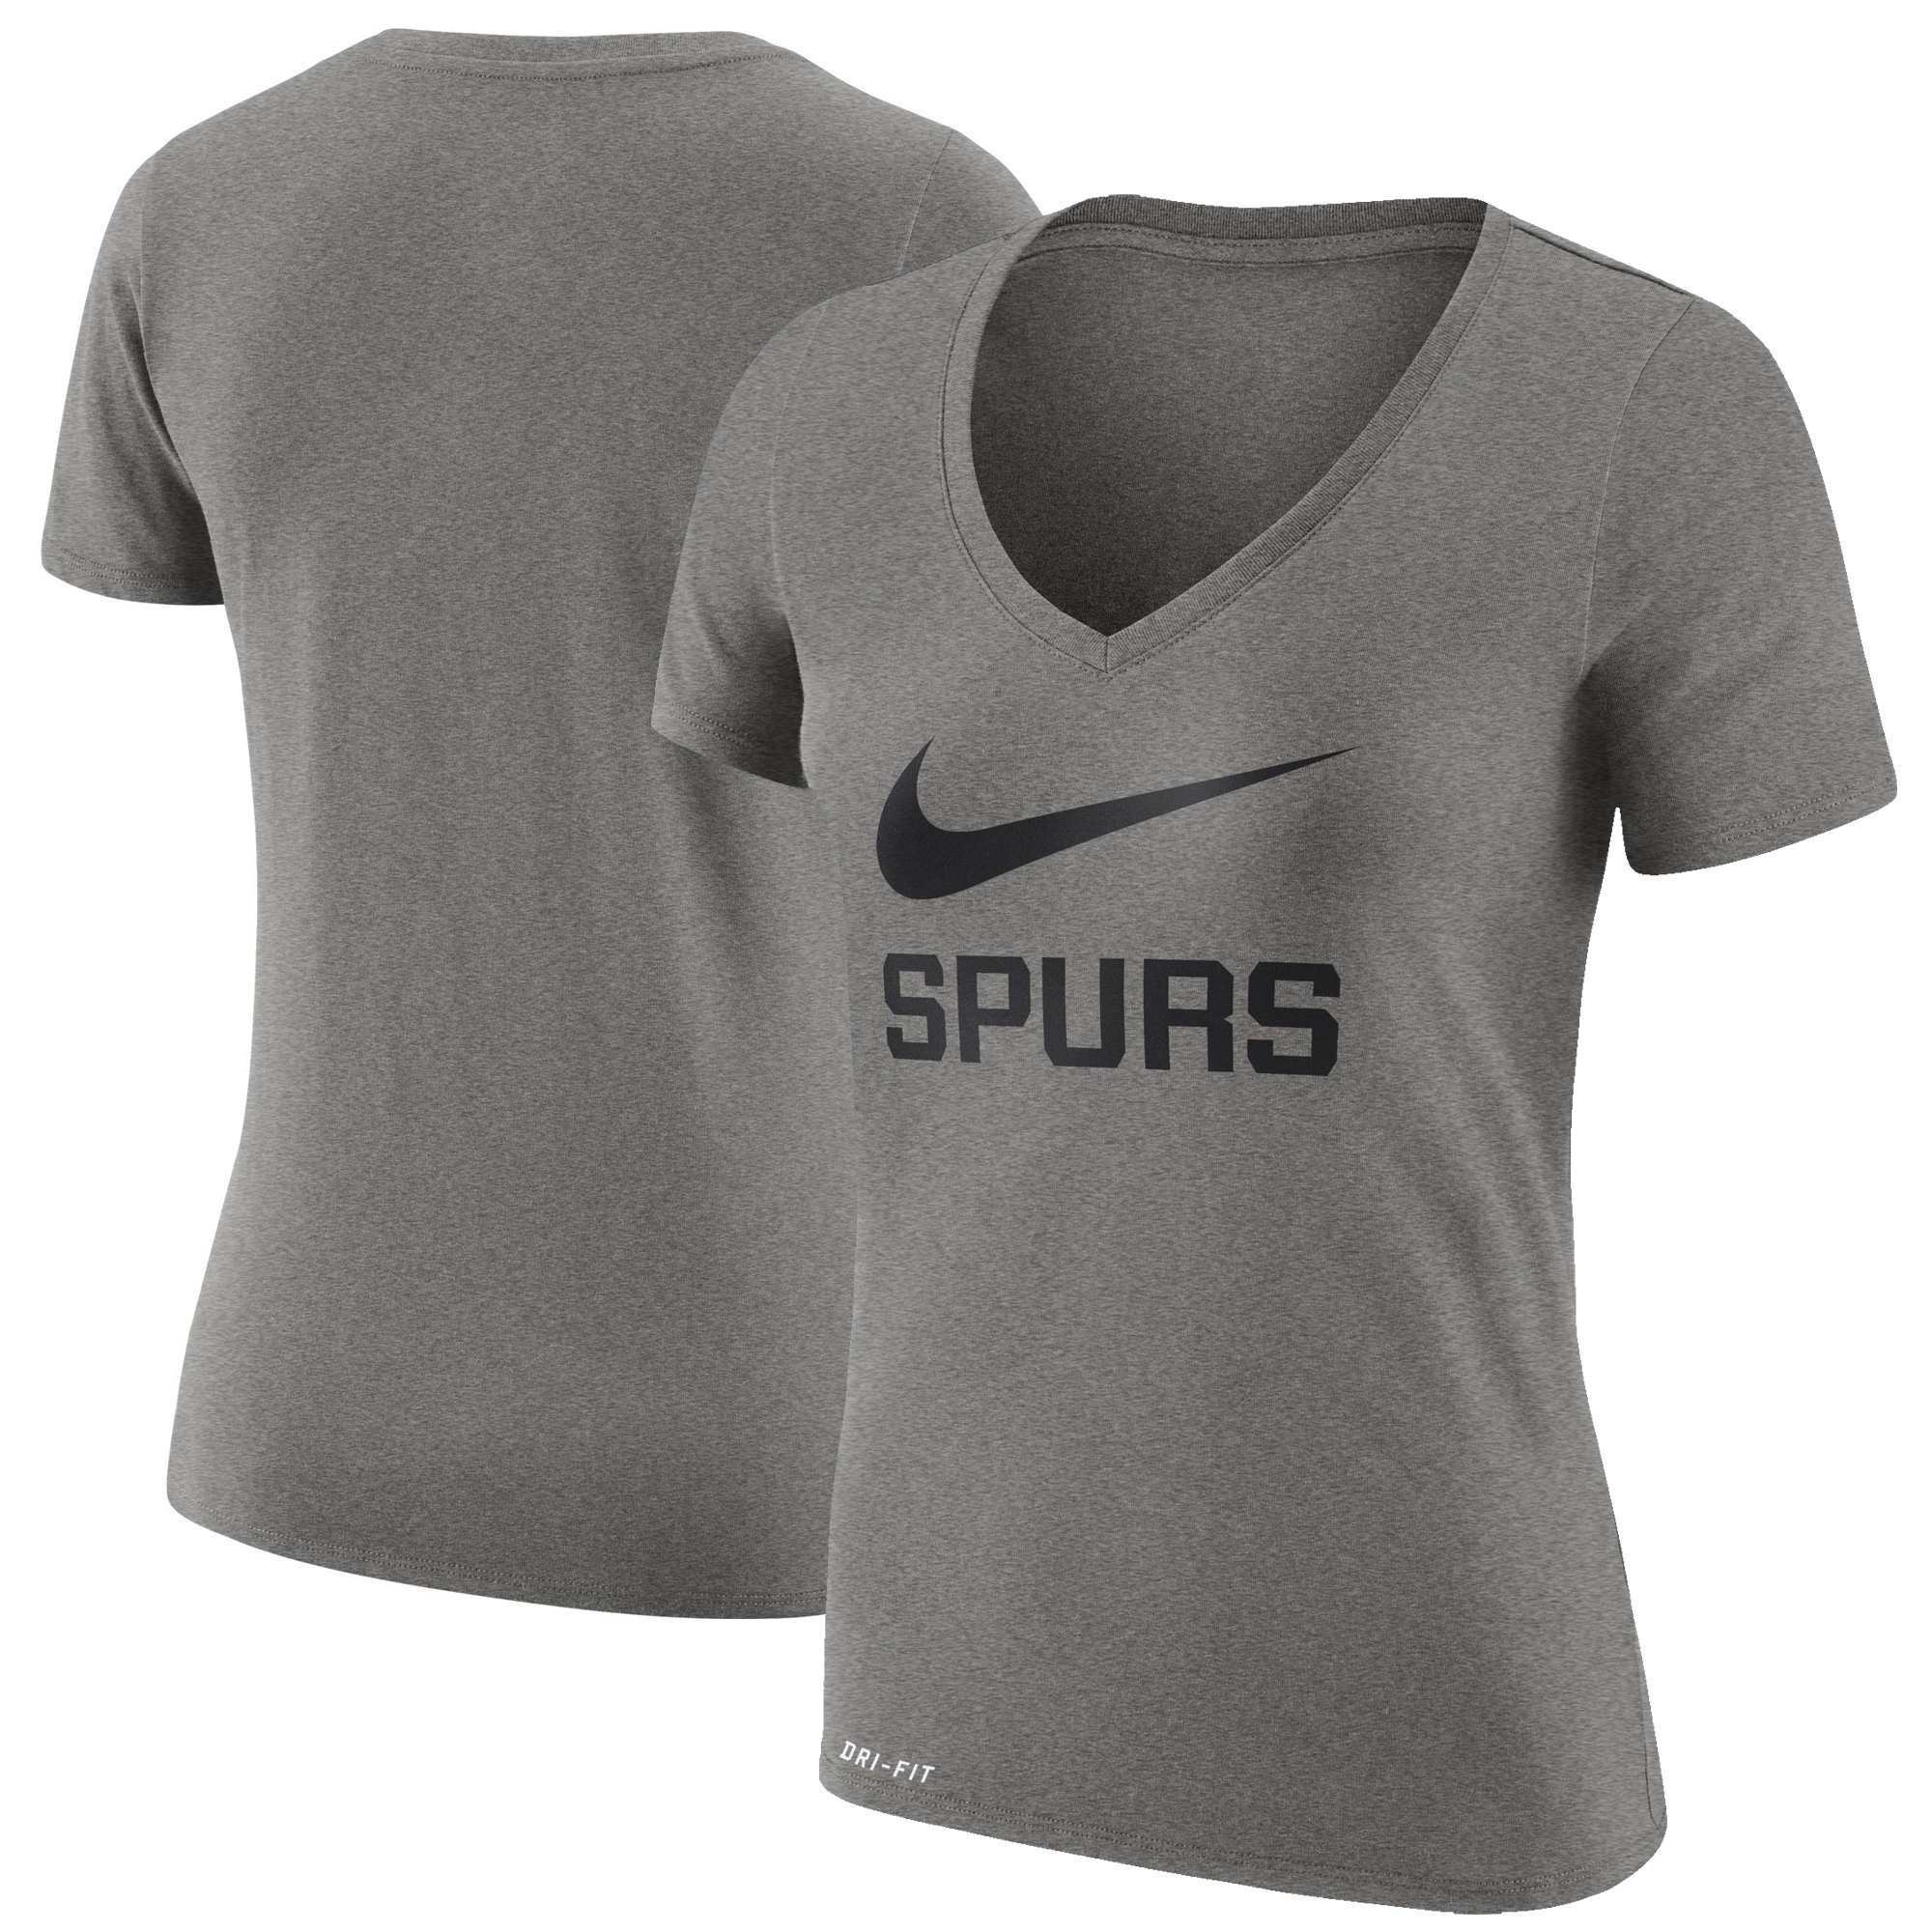 San Antonio Spurs Nike Women's Swoosh V-Neck T-Shirt - Gray